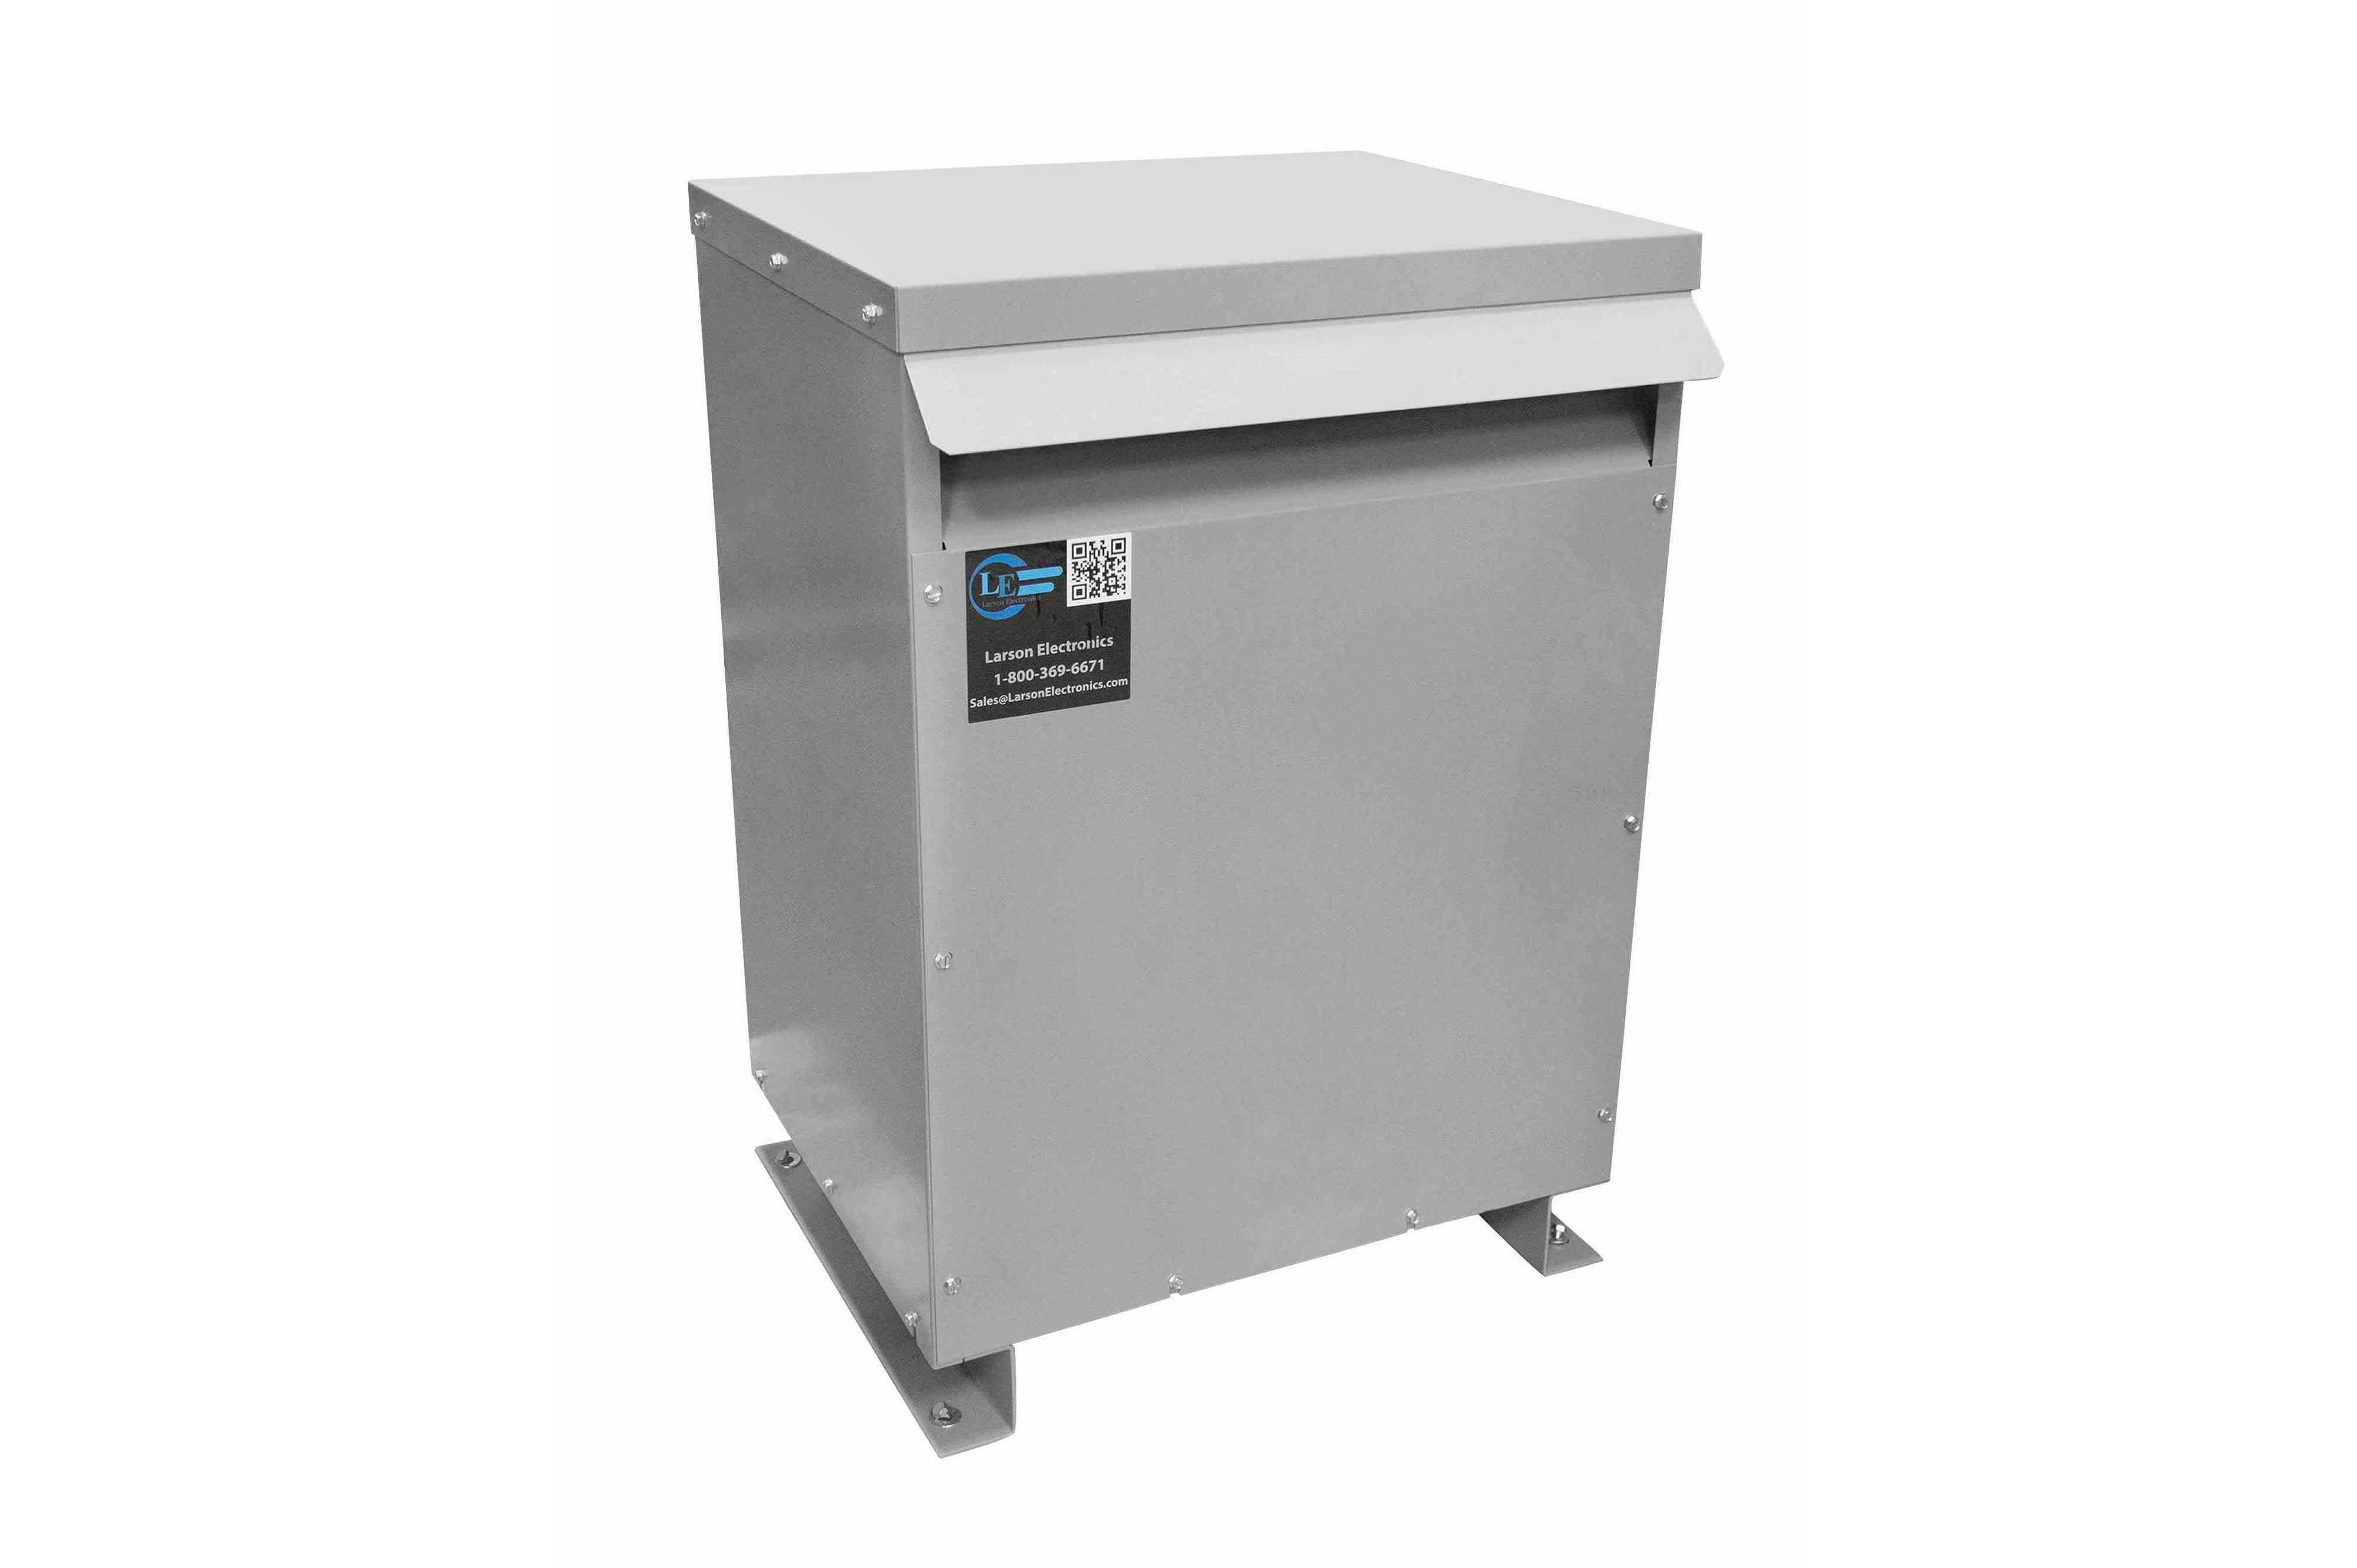 27 kVA 3PH Isolation Transformer, 208V Wye Primary, 380Y/220 Wye-N Secondary, N3R, Ventilated, 60 Hz